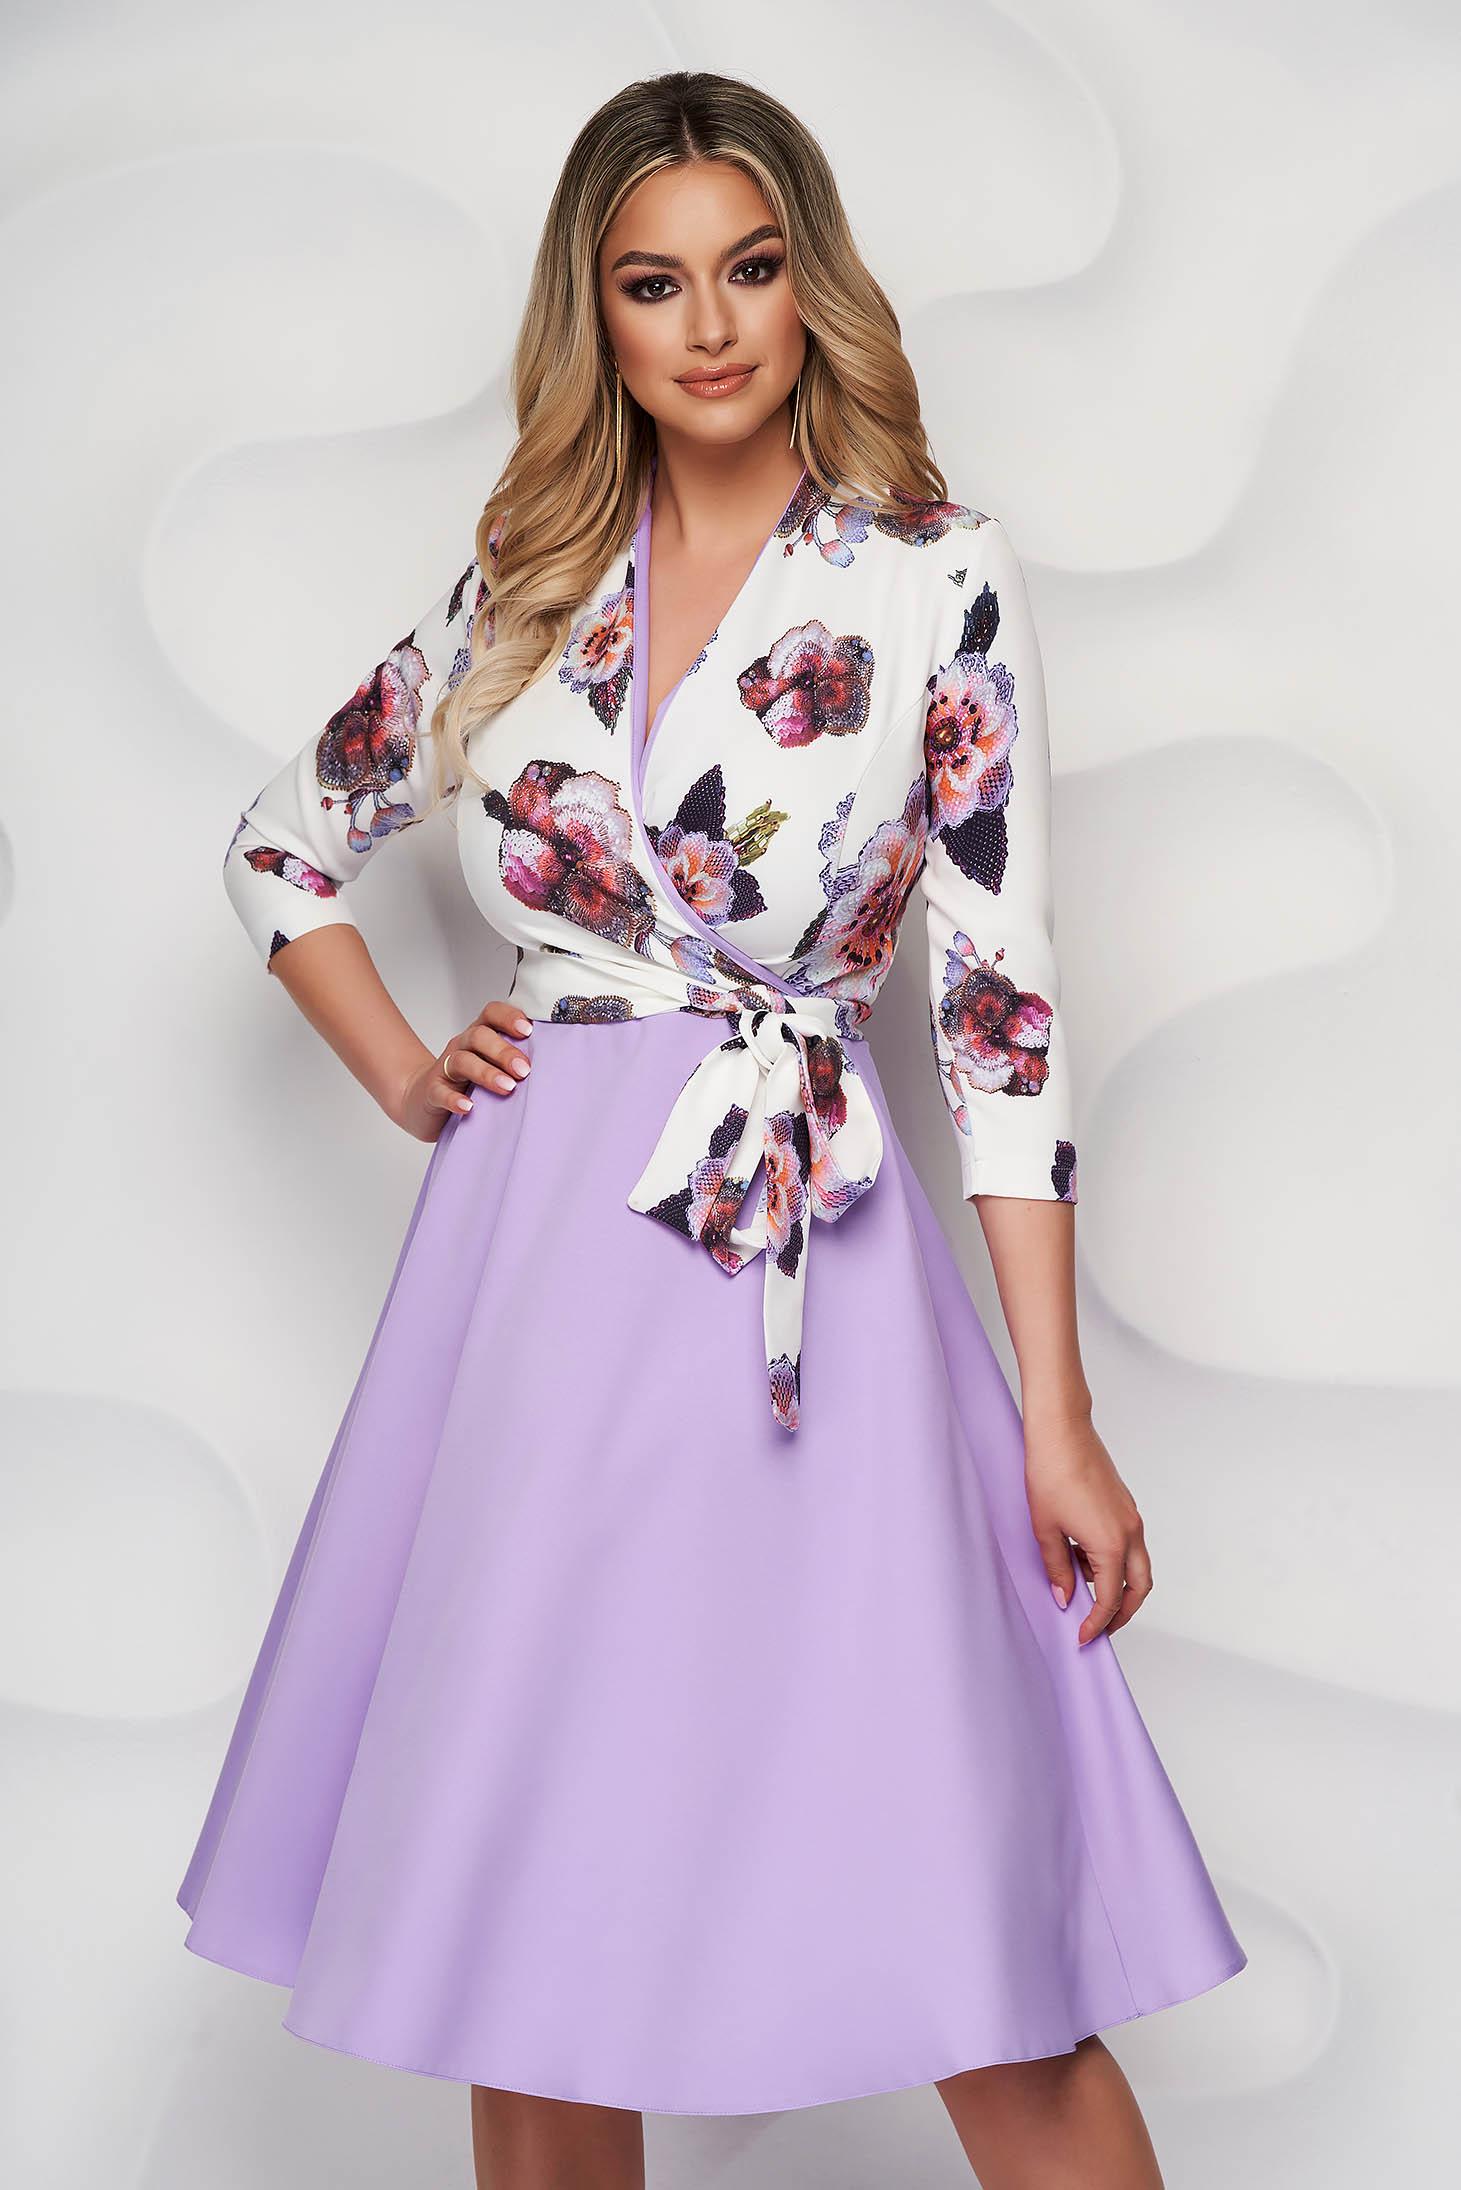 Rochie StarShinerS eleganta lila midi in clos cu decolteu petrecut din material fluid cu imprimeu floral